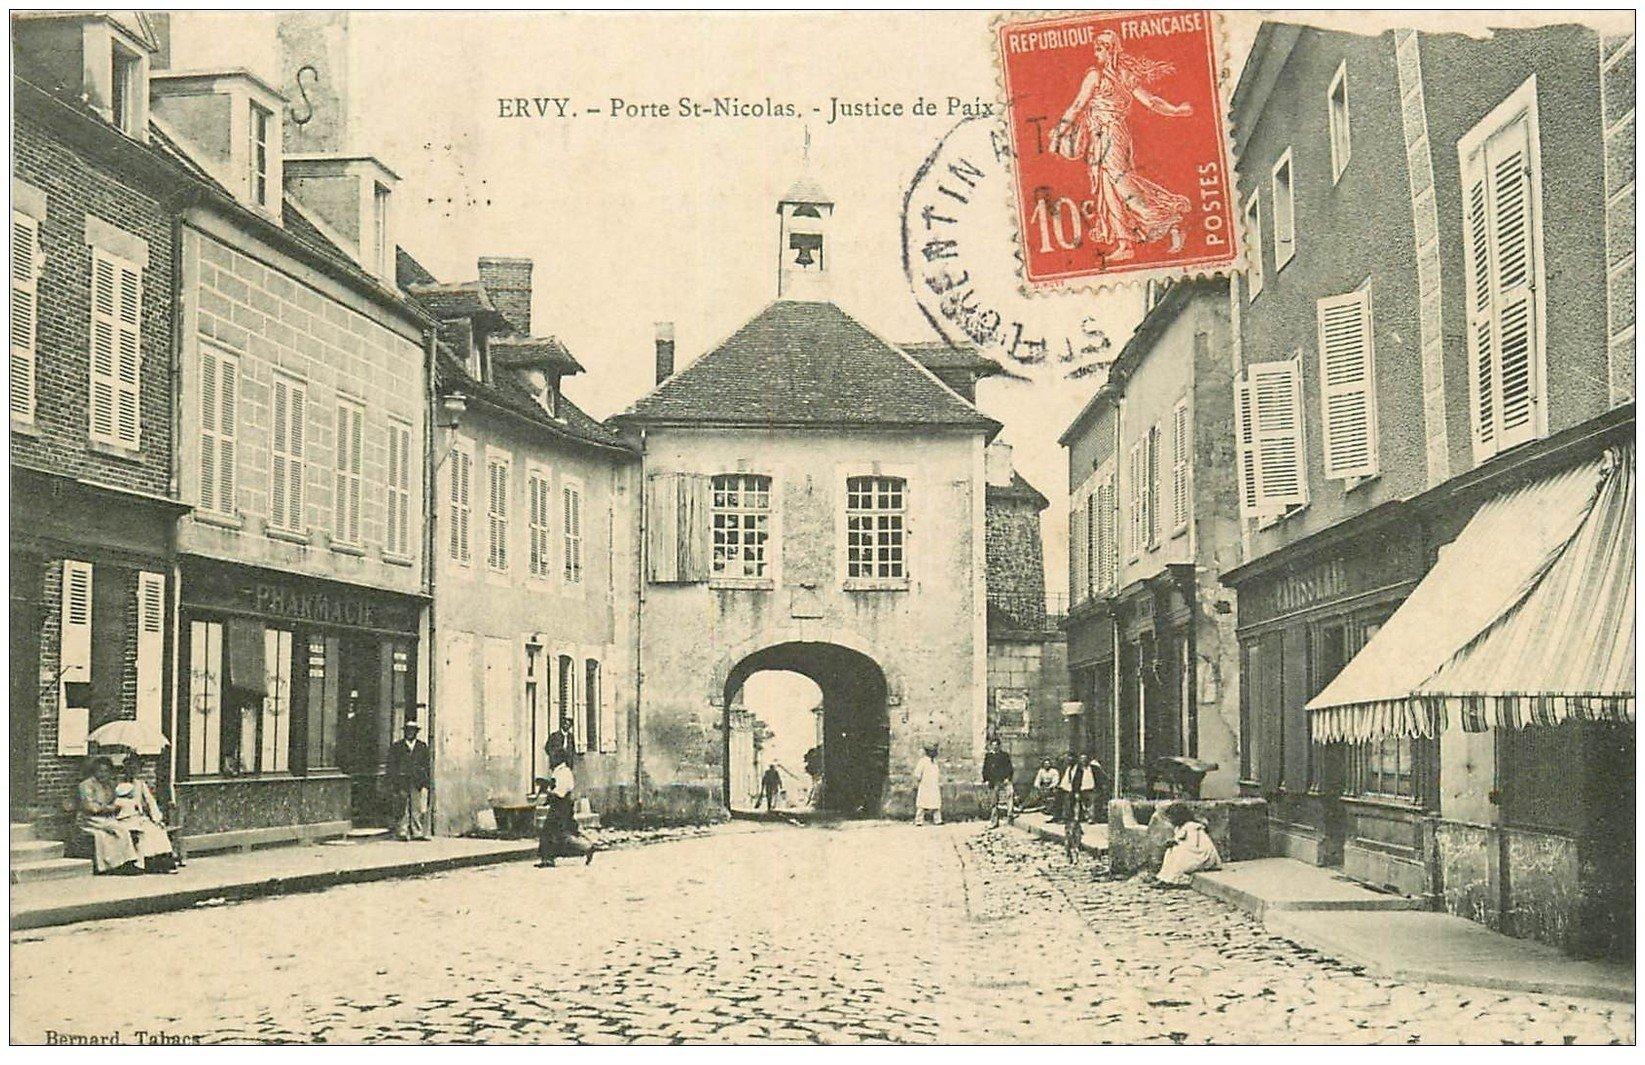 10 ervy justice de paix porte nicolas 1908 pharmacie et patisserie